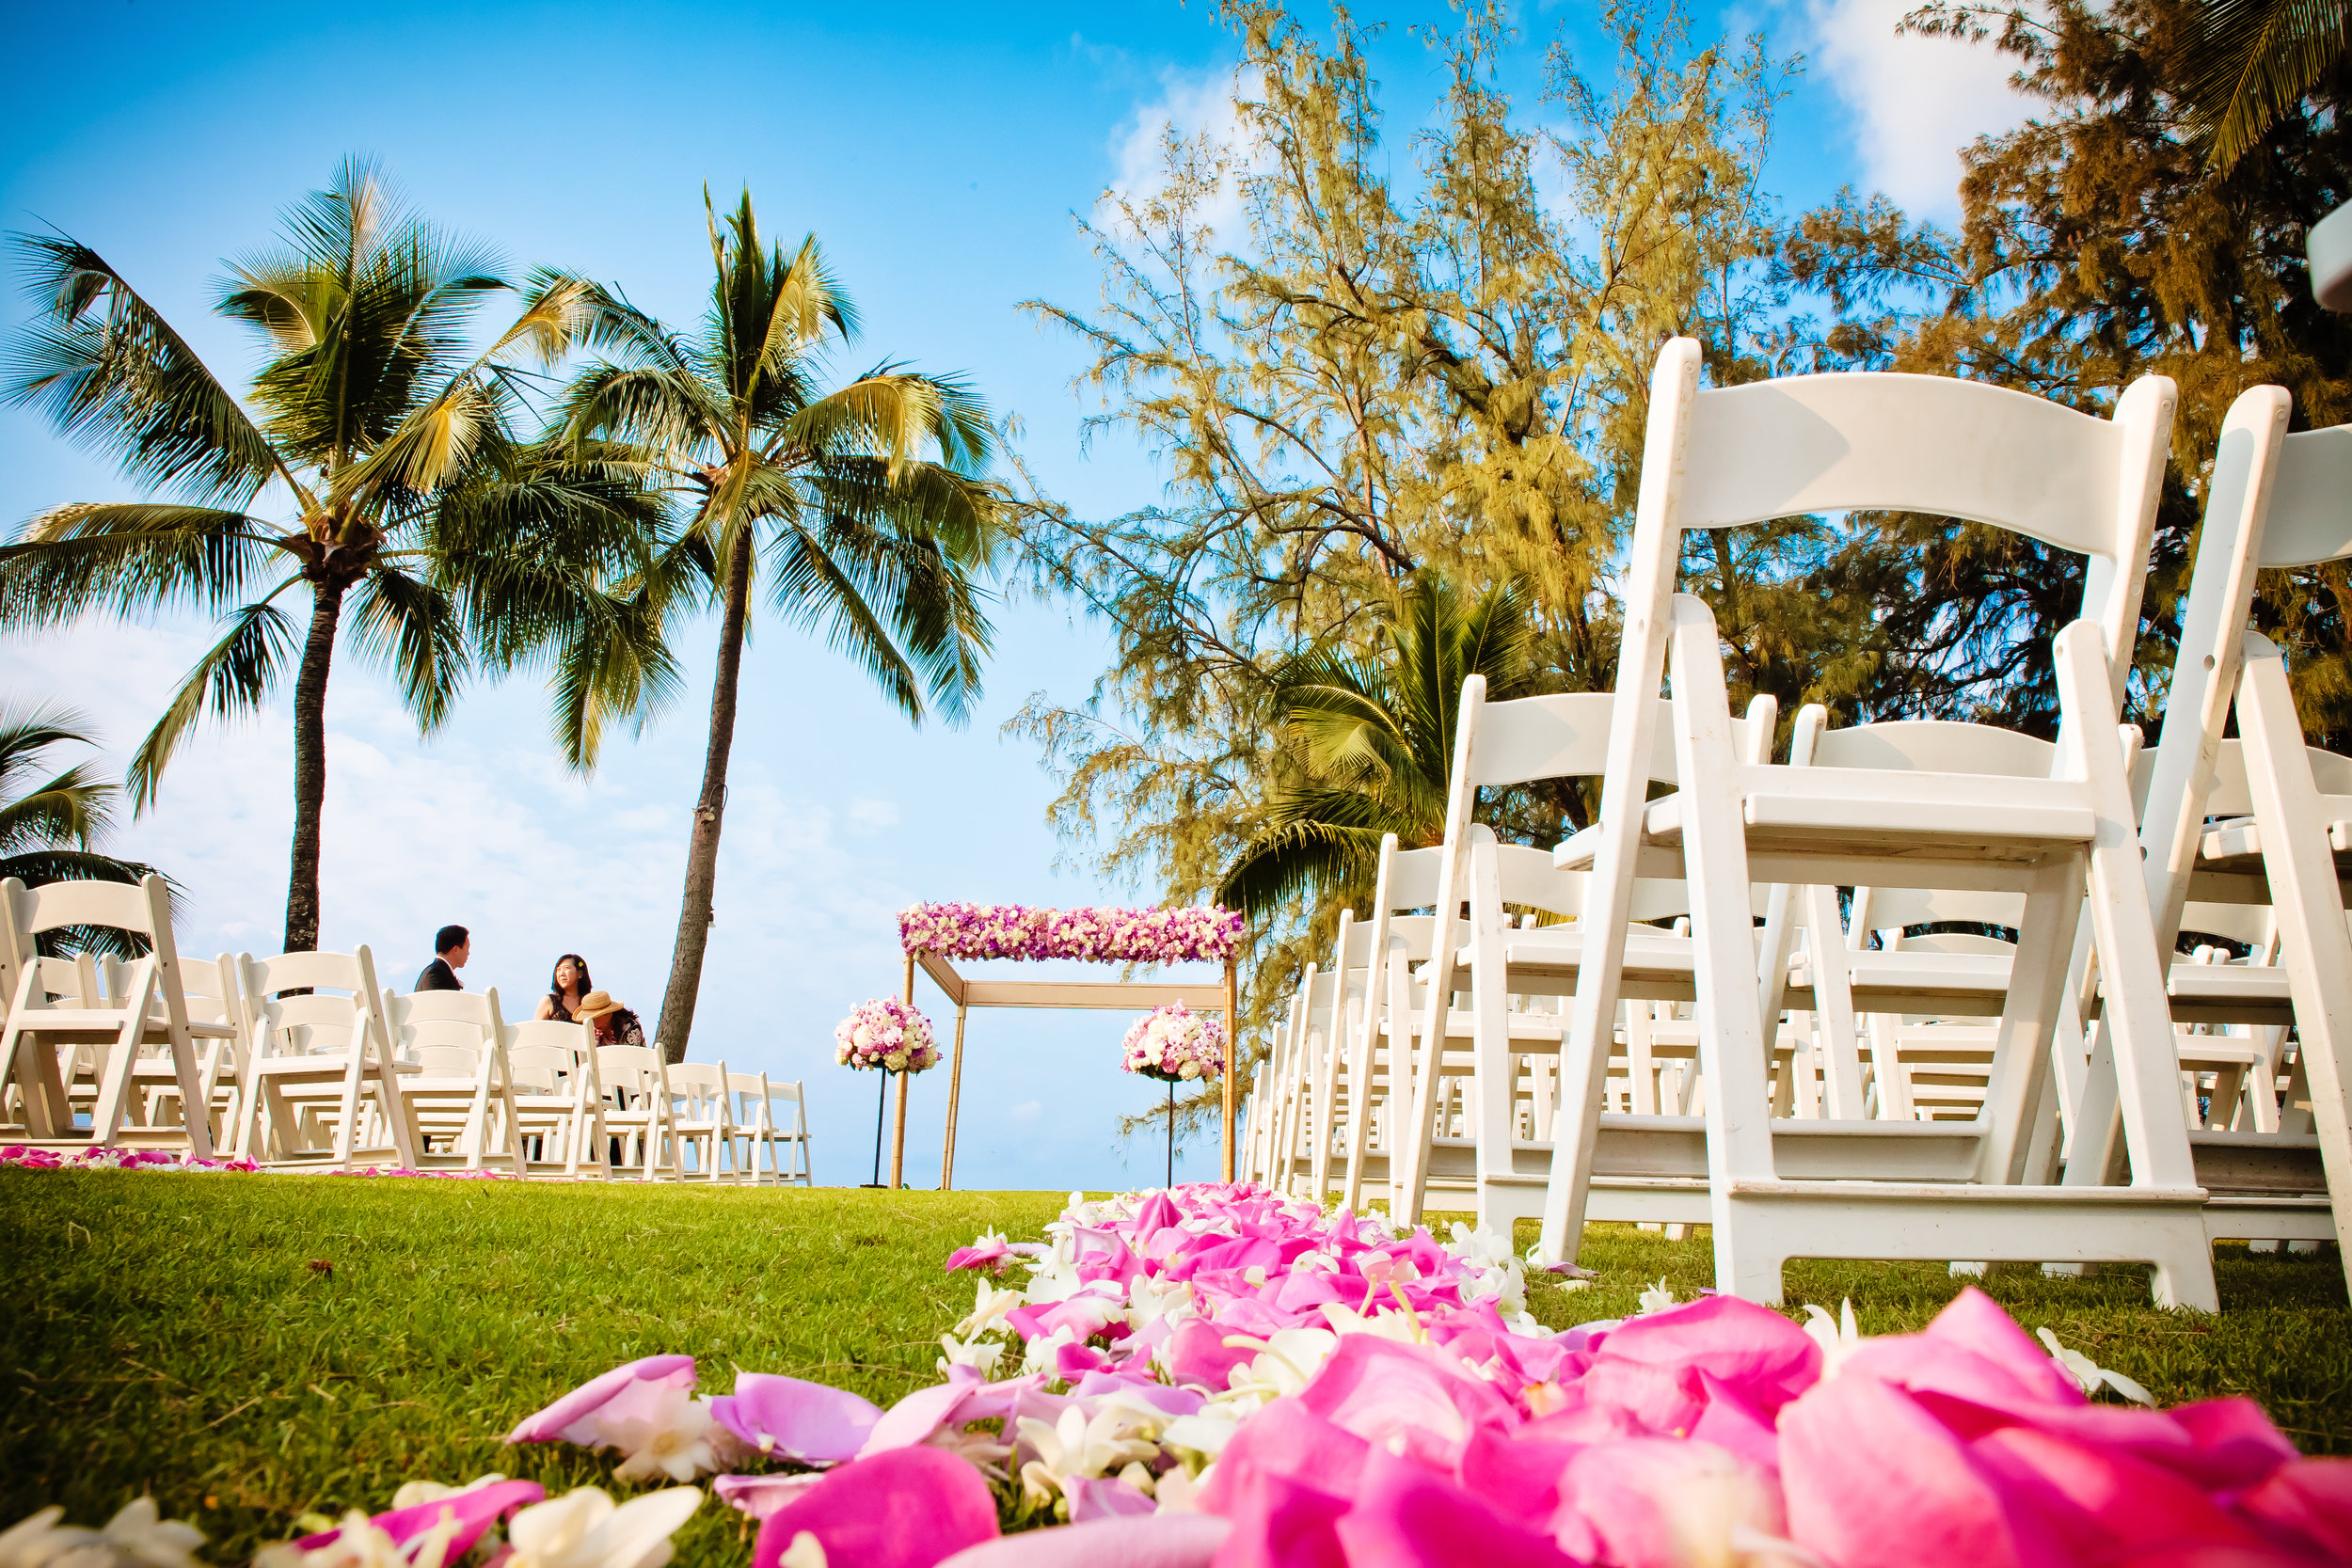 maui-hawaii-destination-wedding-0026.jpg